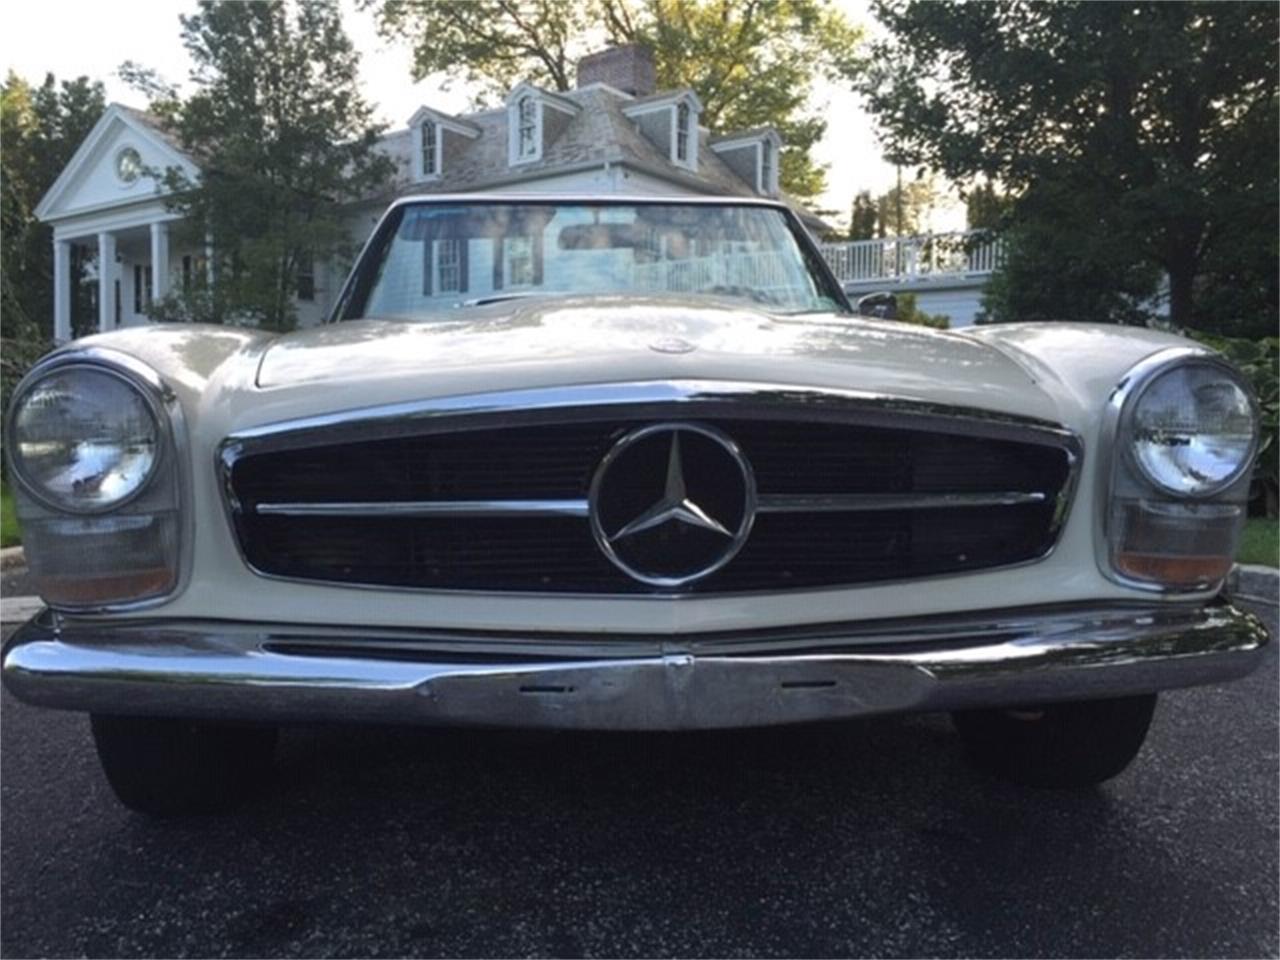 1966 Mercedes-Benz 230SL (CC-1159093) for sale in Sag Harbor, New York